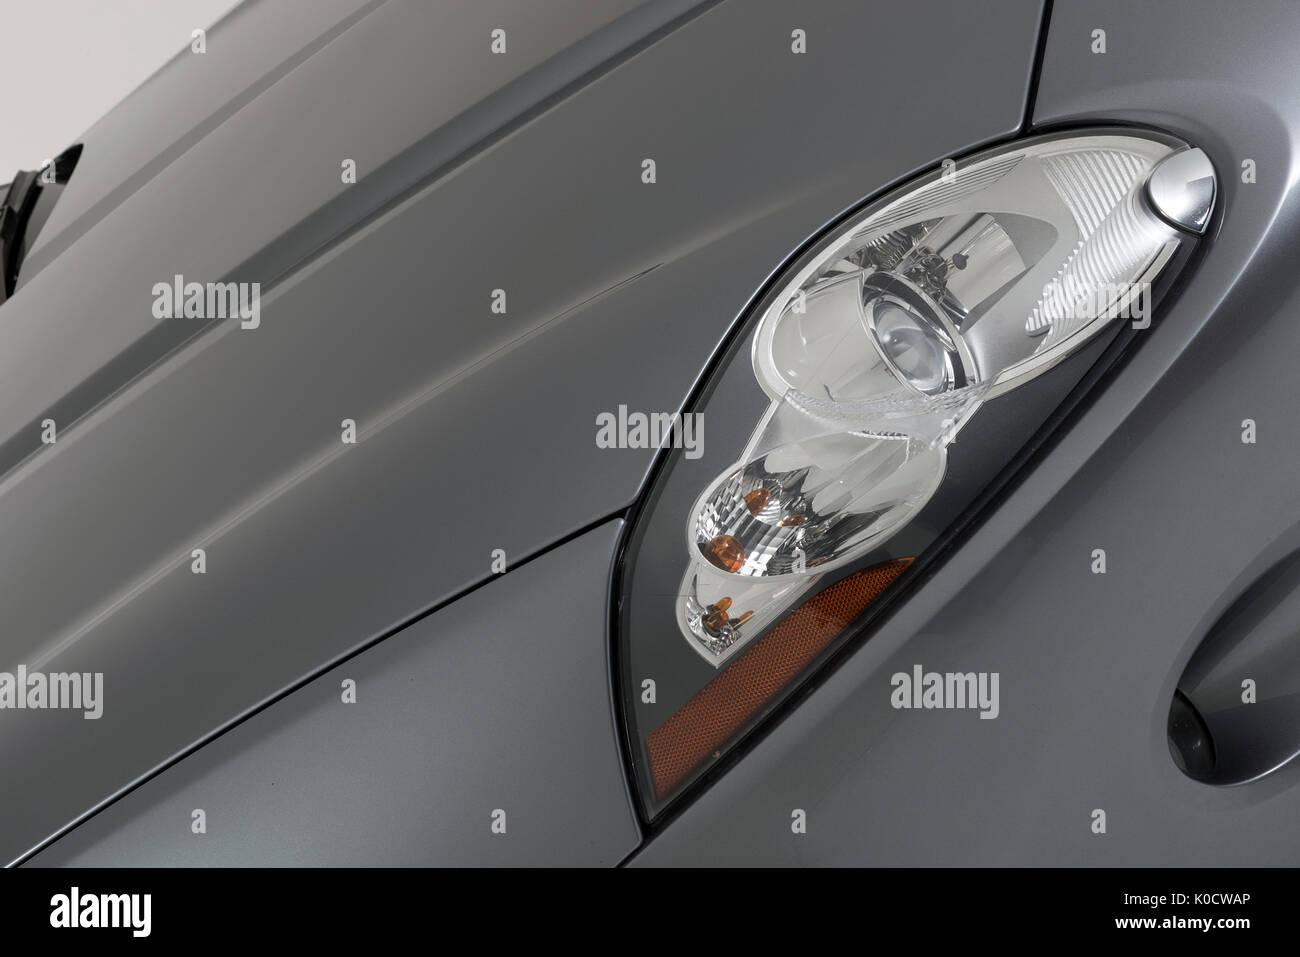 2006 Jaguar XK 4.2 Convertible - Stock Image